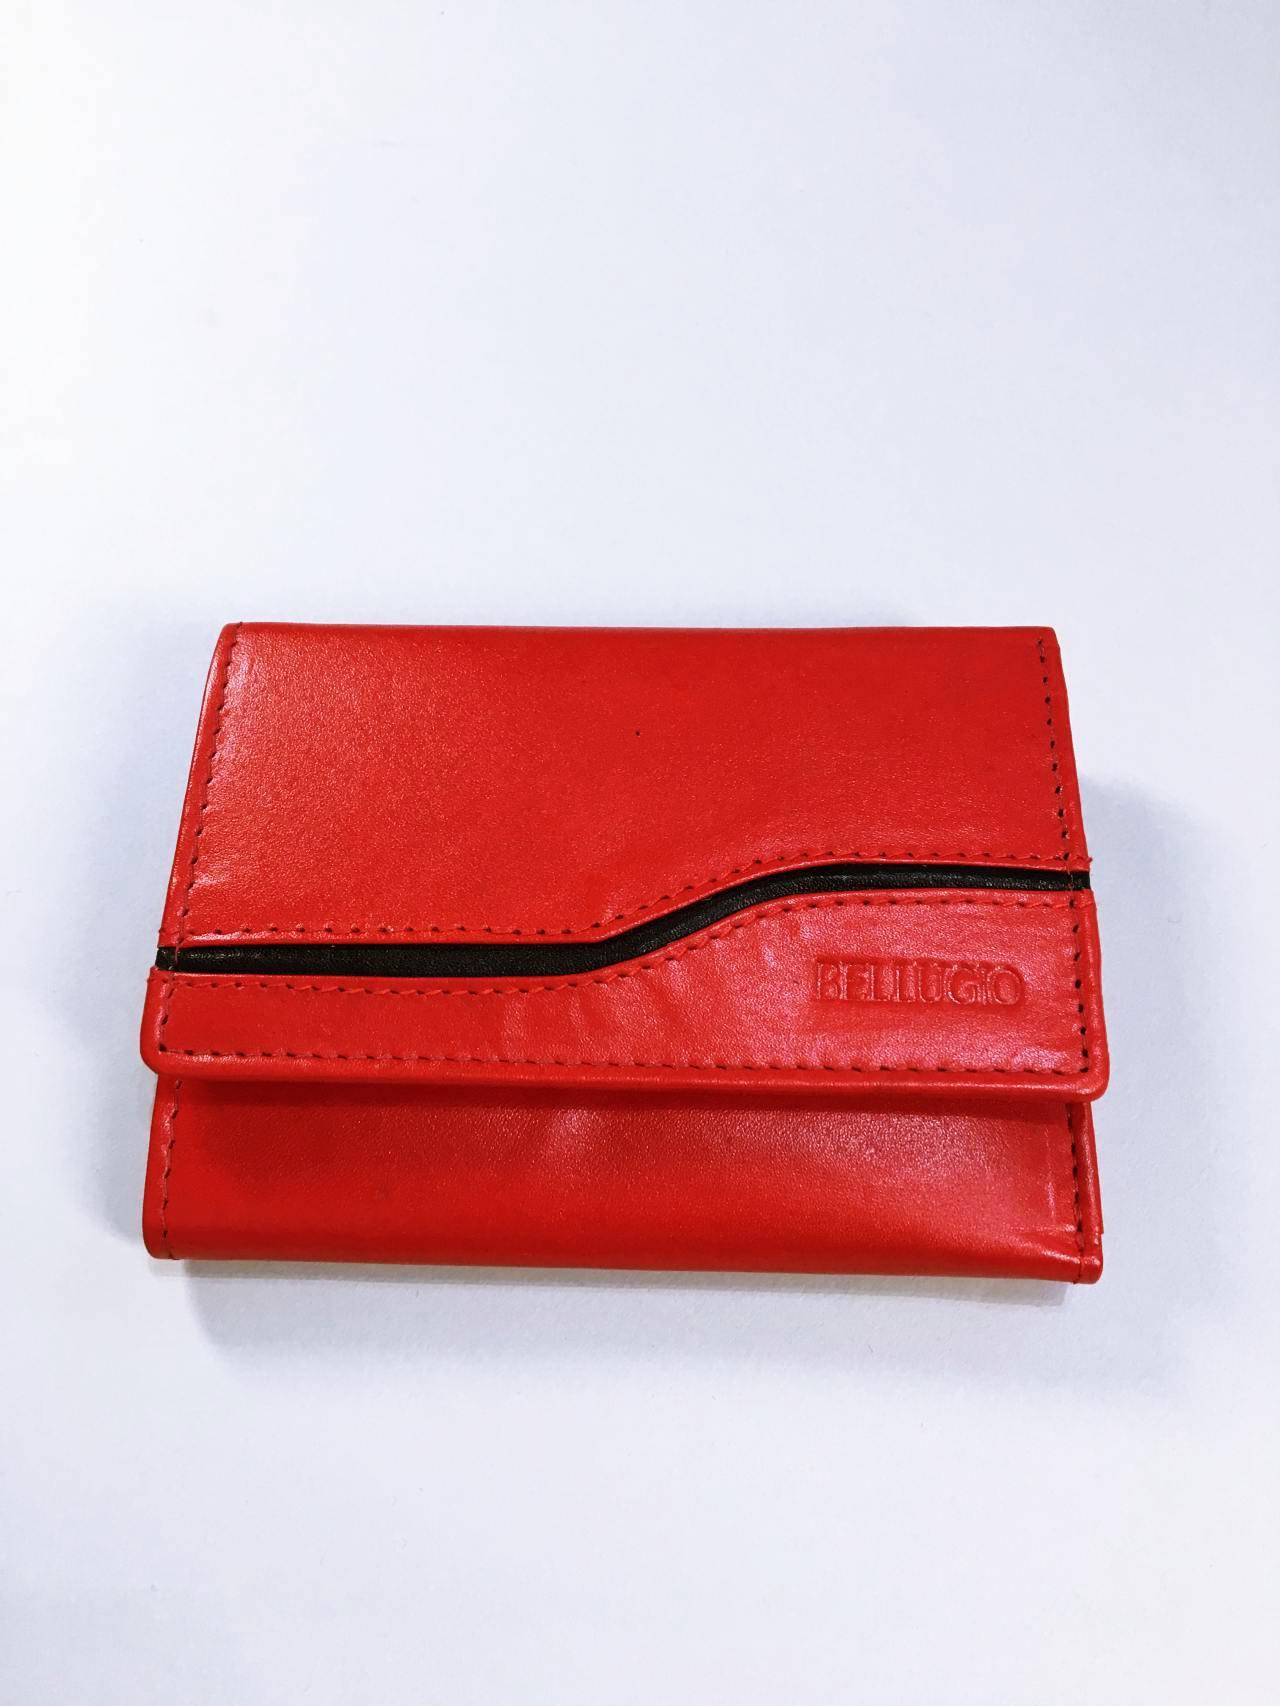 Kožená peněženka Bellugio červená 01